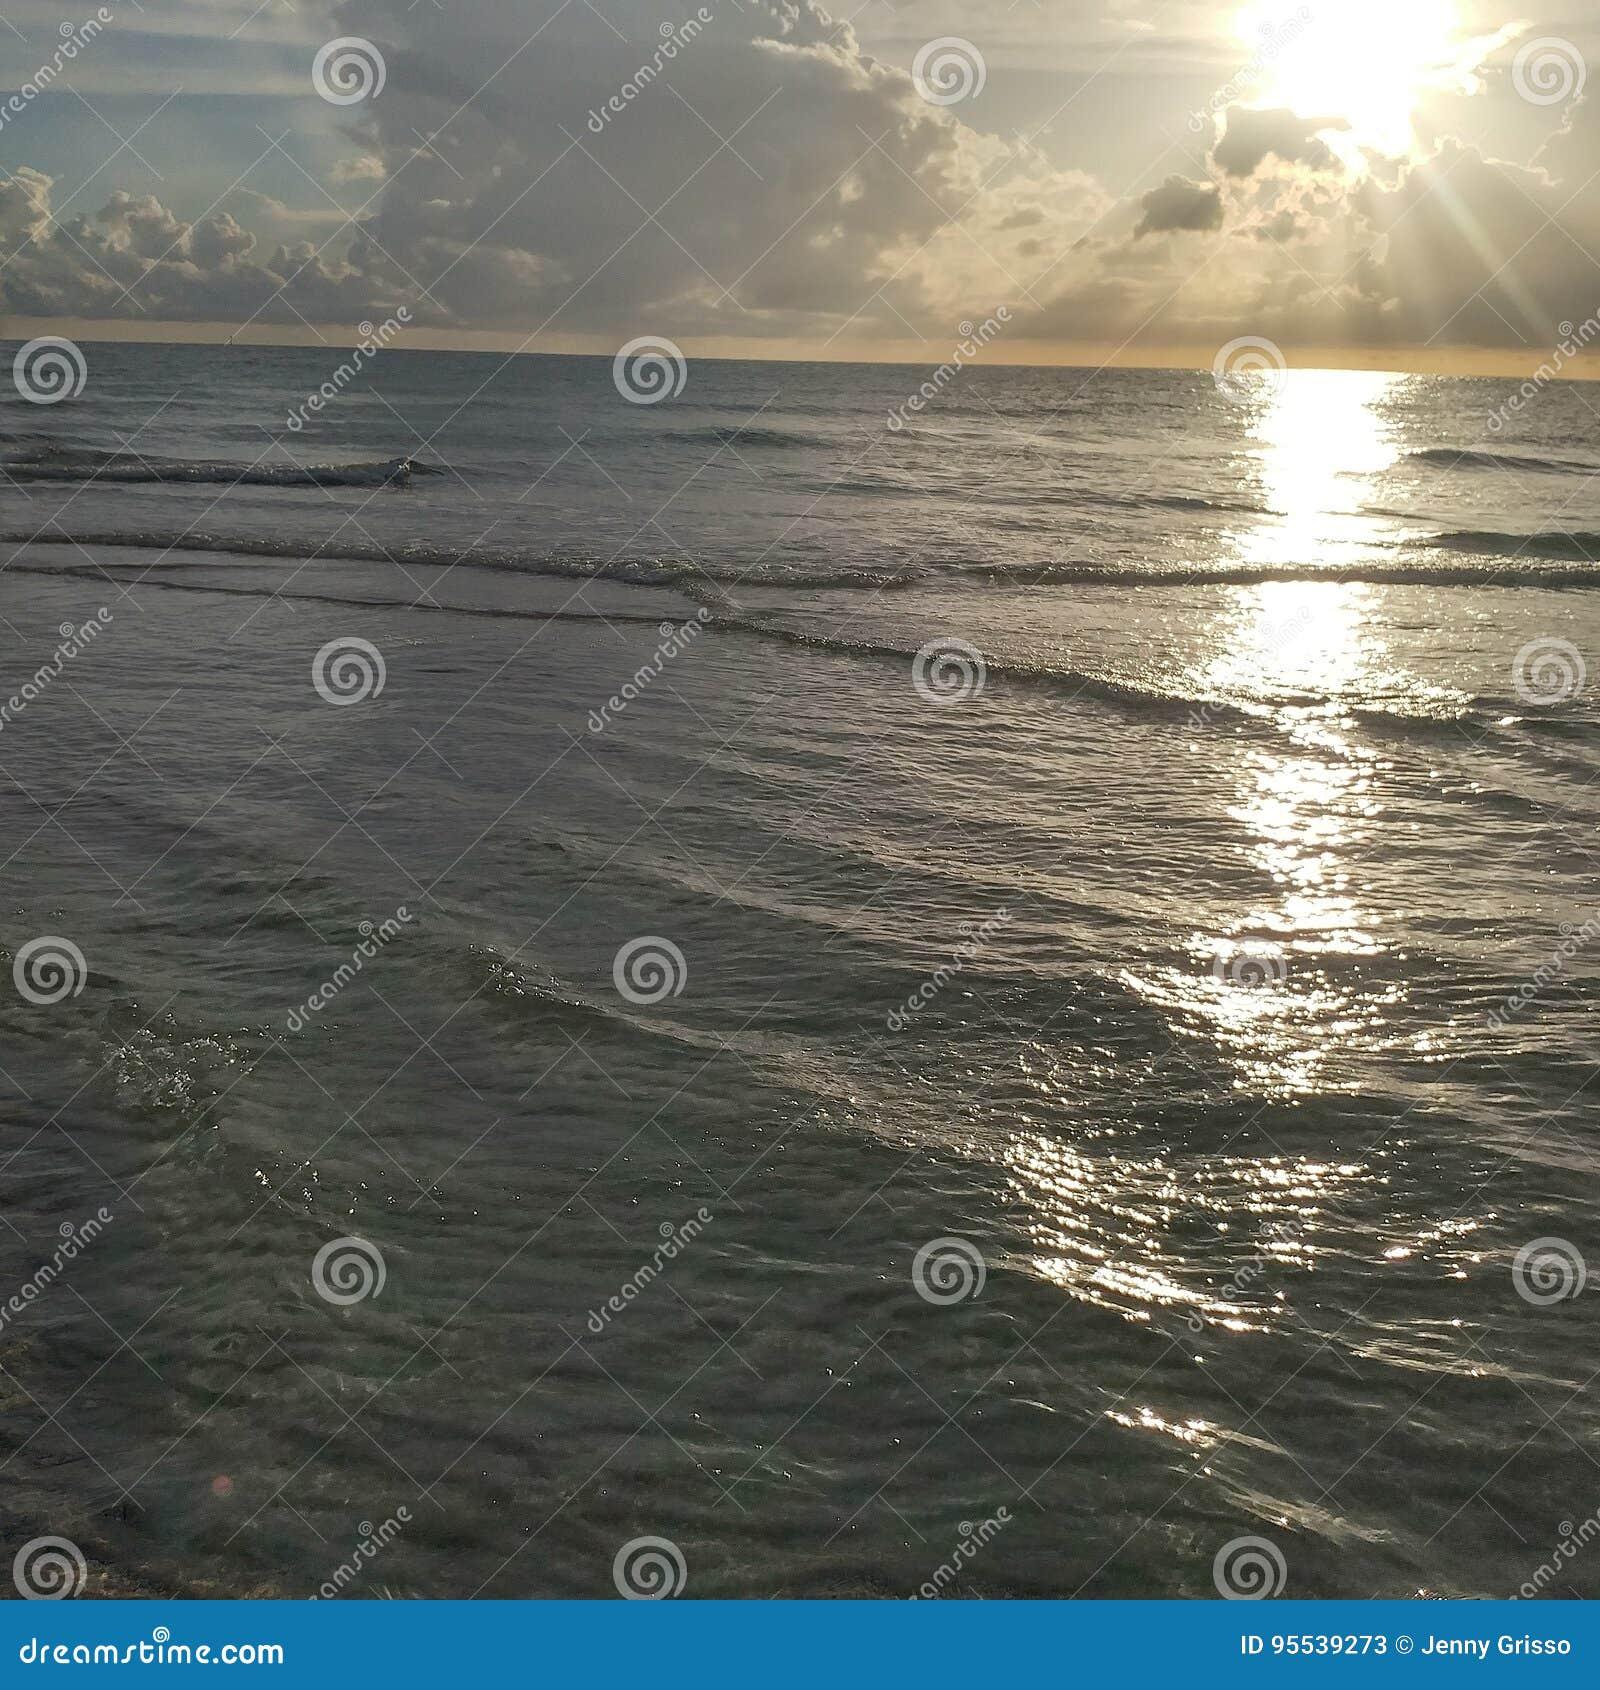 FLorida southwest sunset view, beaches